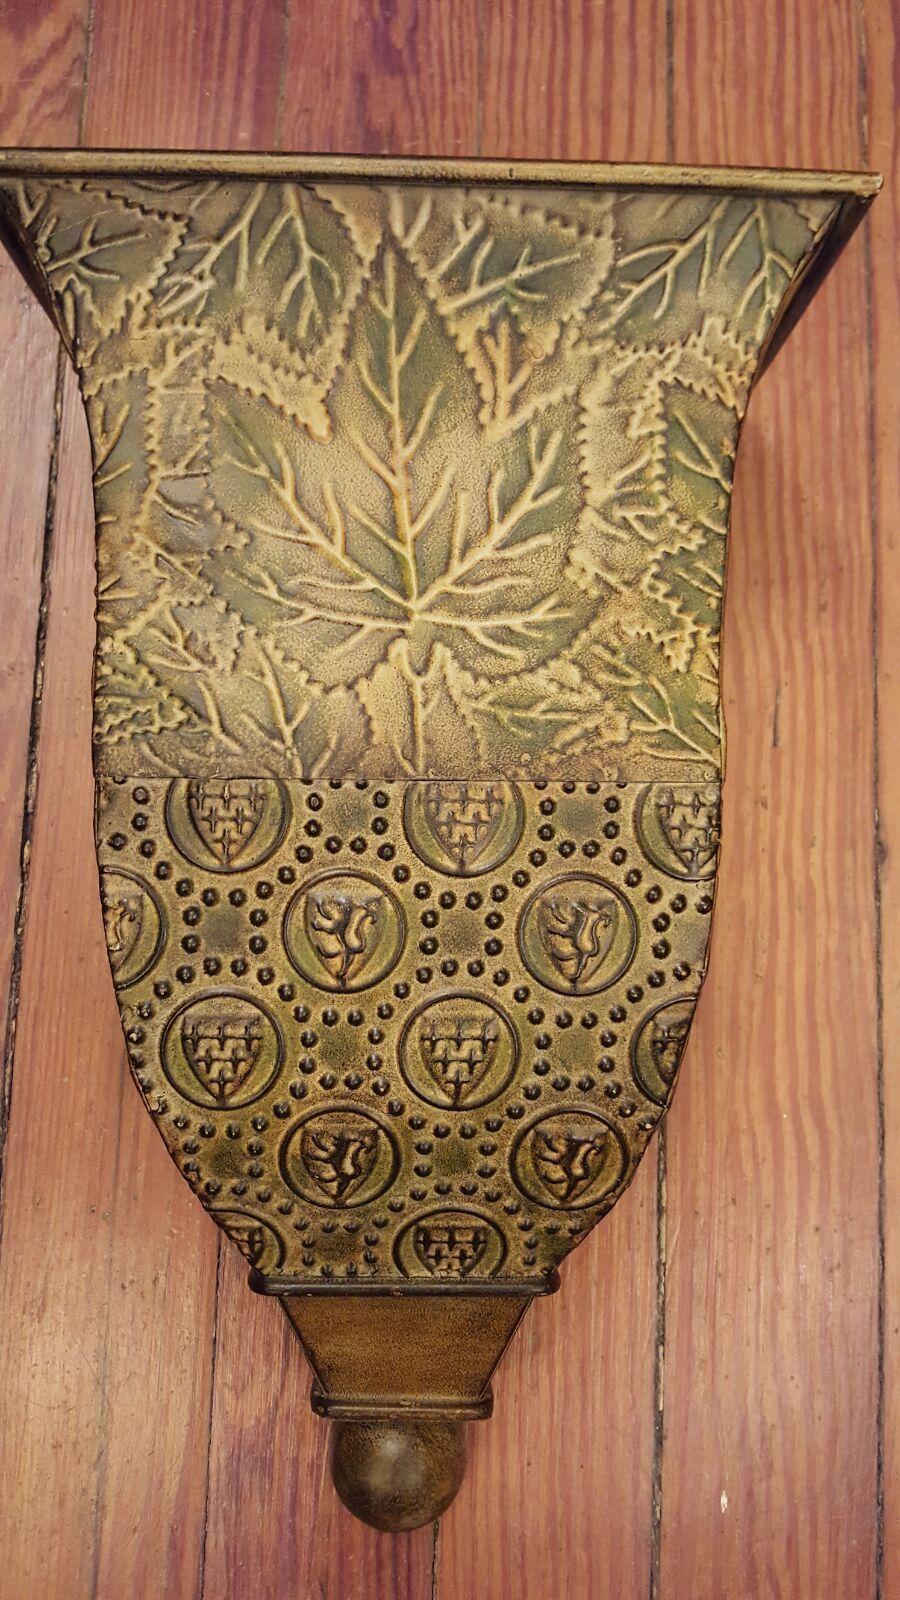 Extra Large metal wall sconce flower vase, Leaf design ... on Pocket Wall Sconce For Flowers id=48691